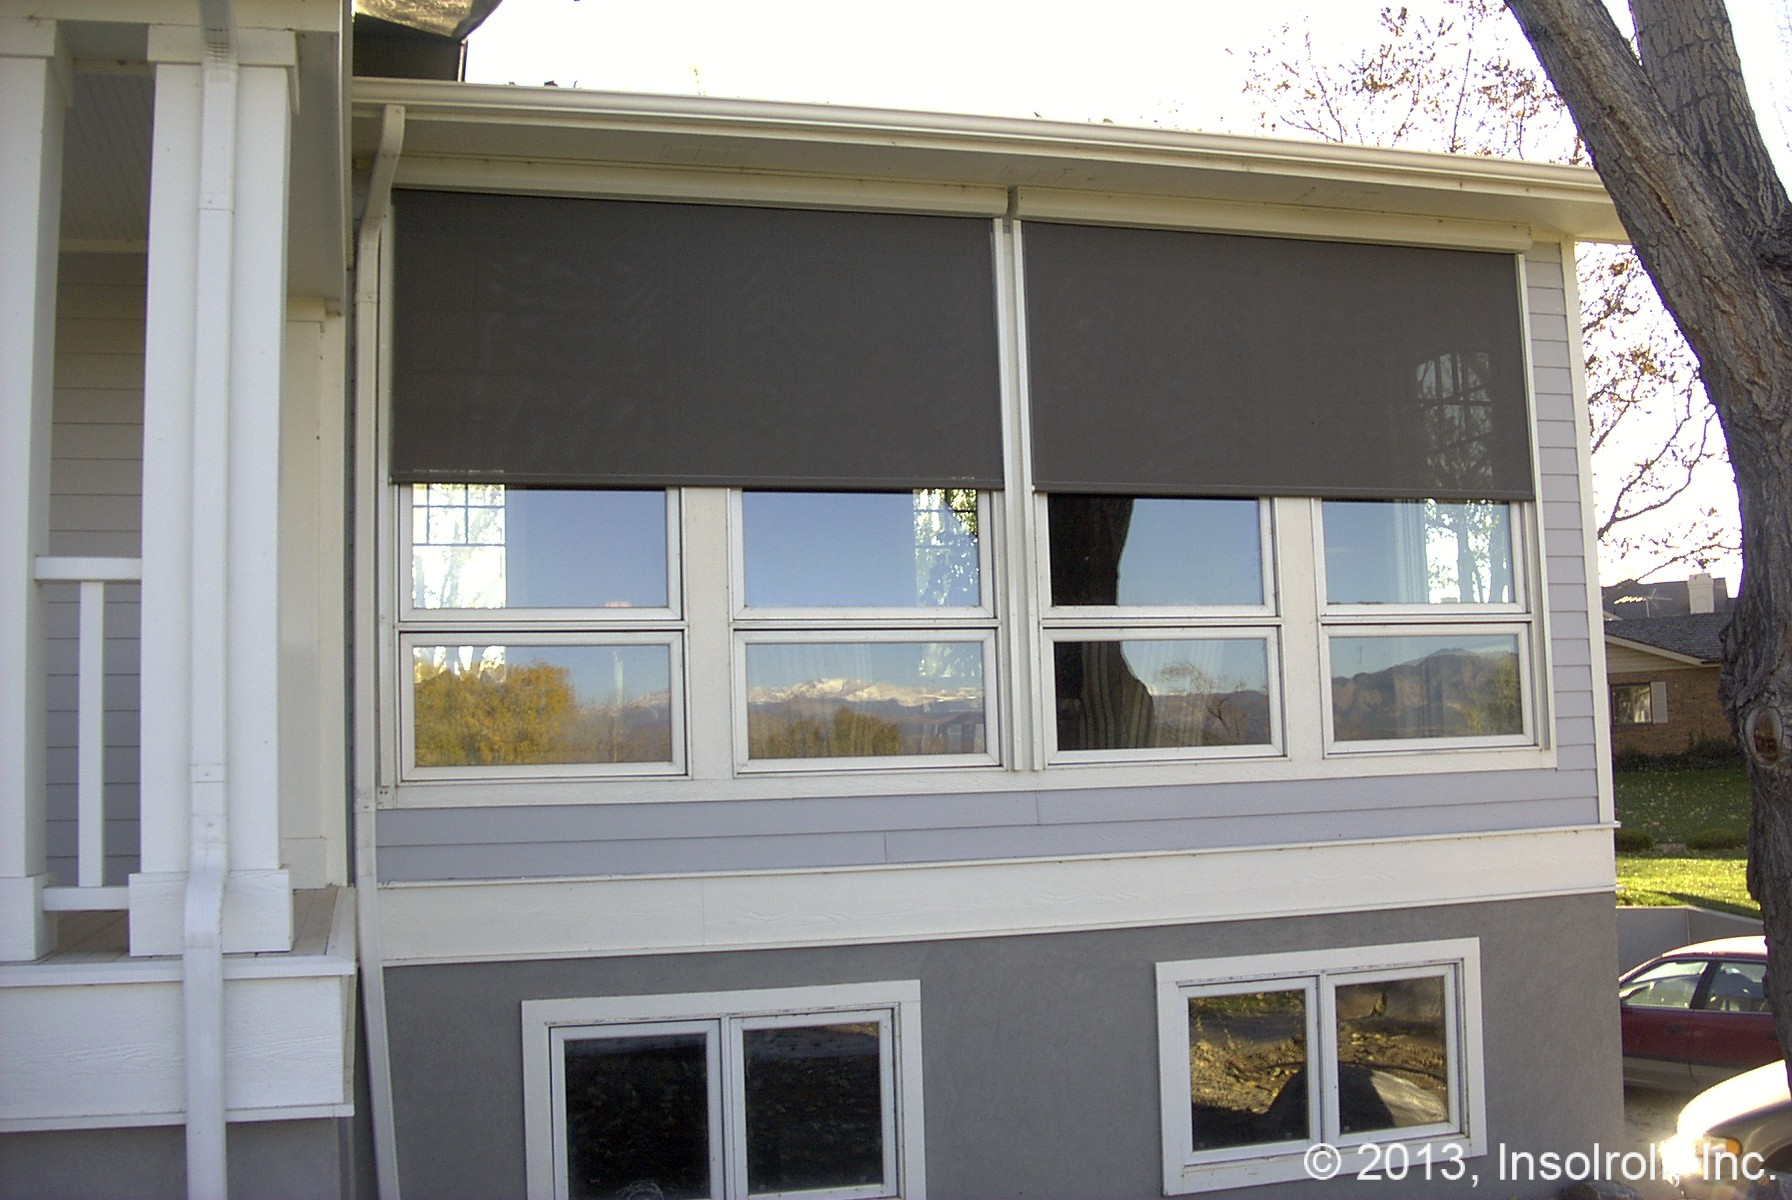 Toshiba exif jpeg exterior window